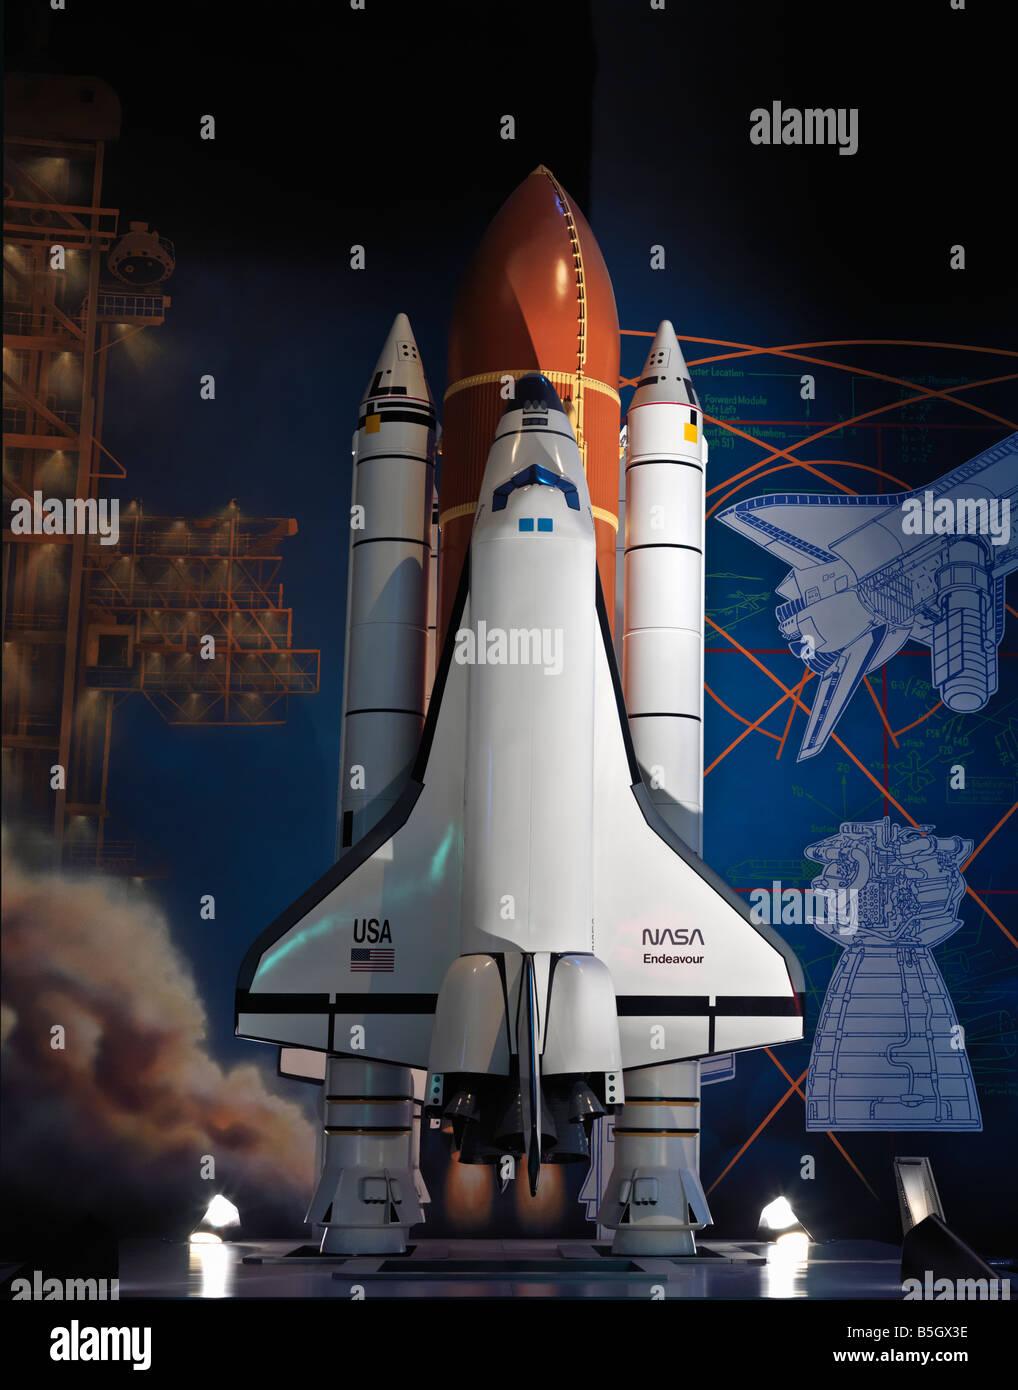 USA,Texas,Houston,Space Center Houston NASA Johnson Space Center display of the Challenger - Stock Image